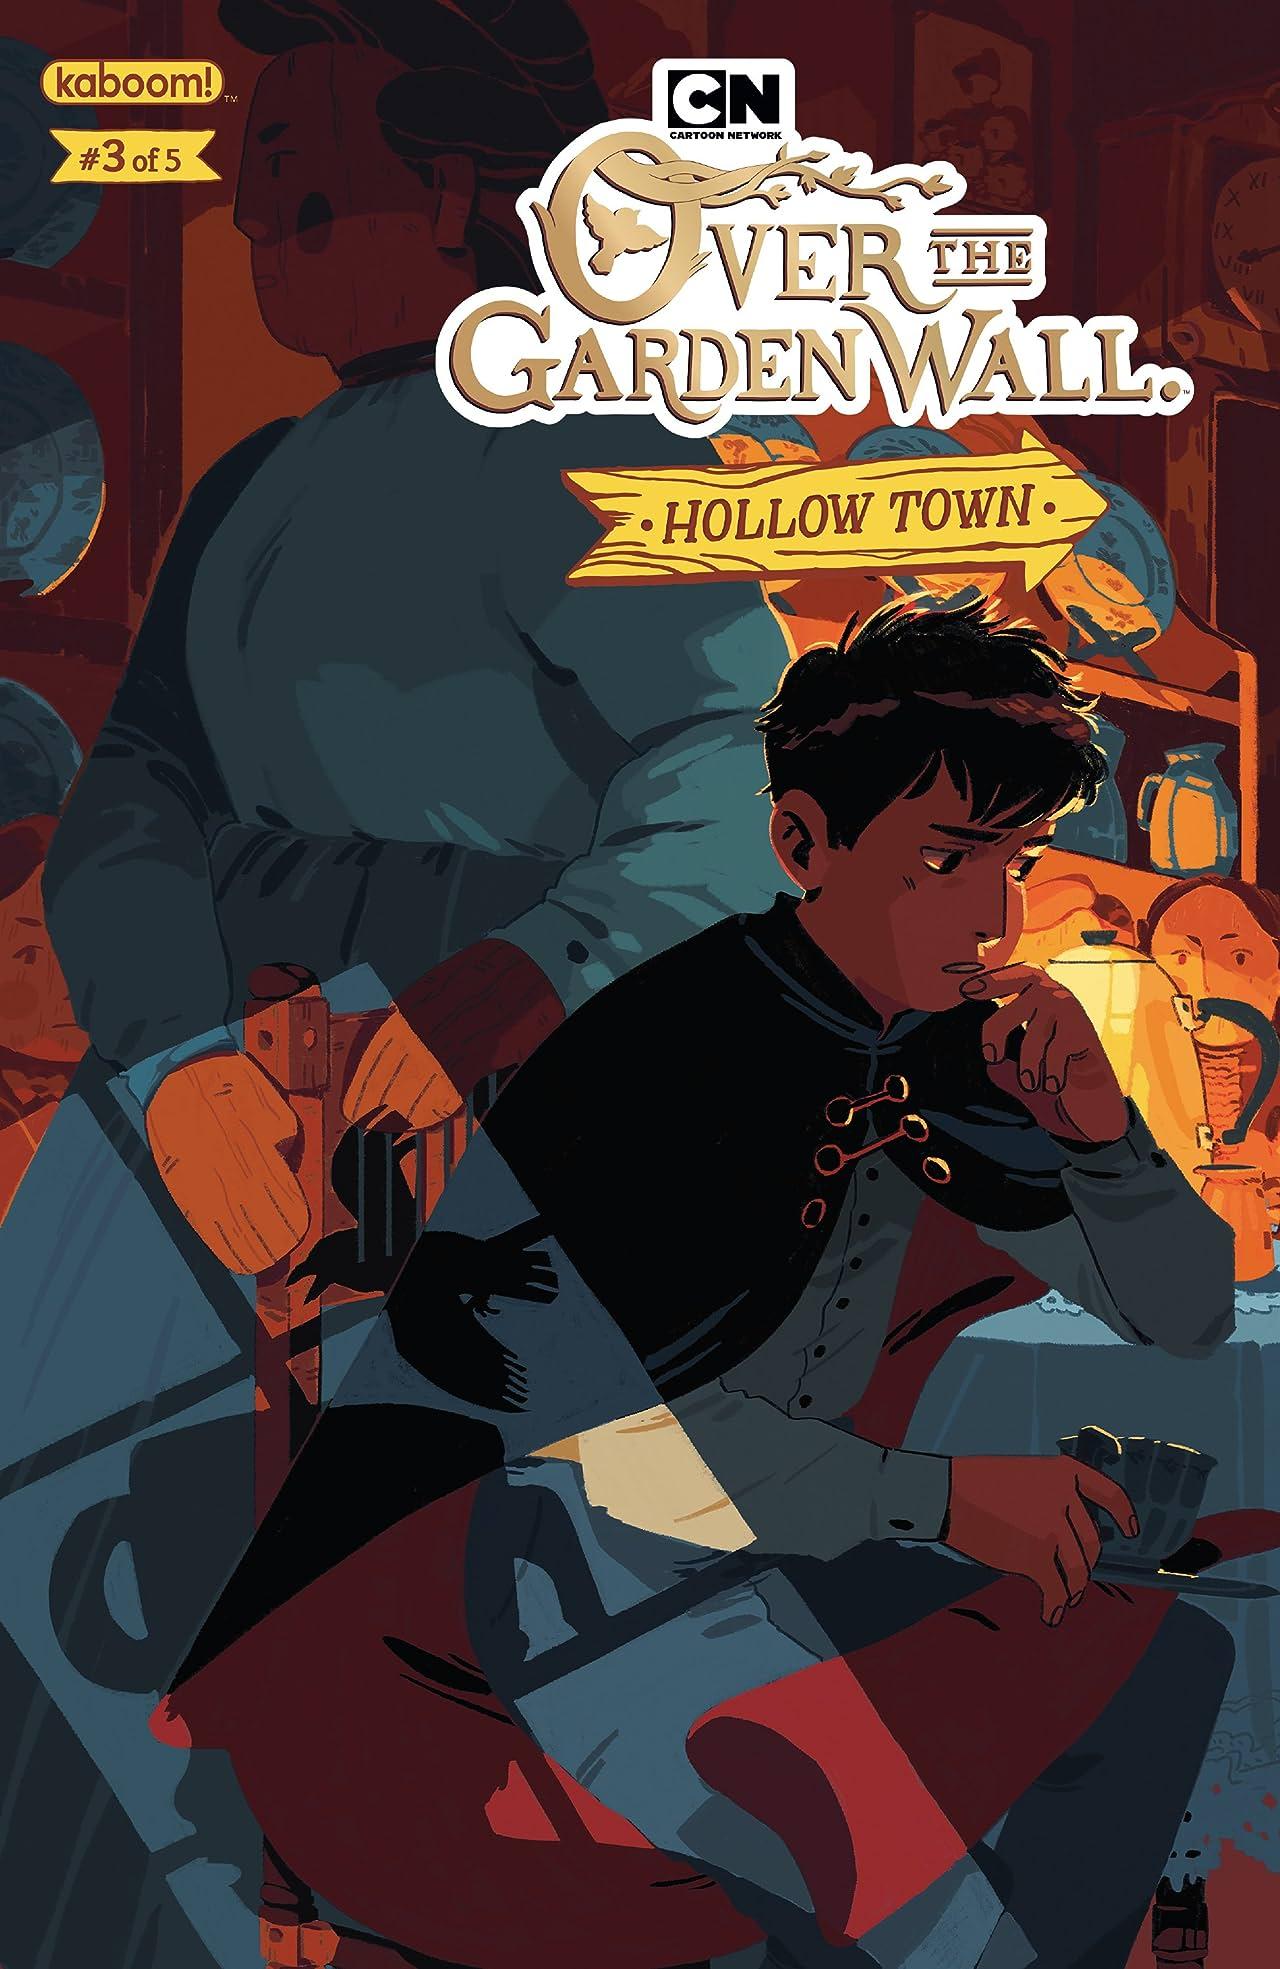 Over the Garden Wall: Hollow Town #3